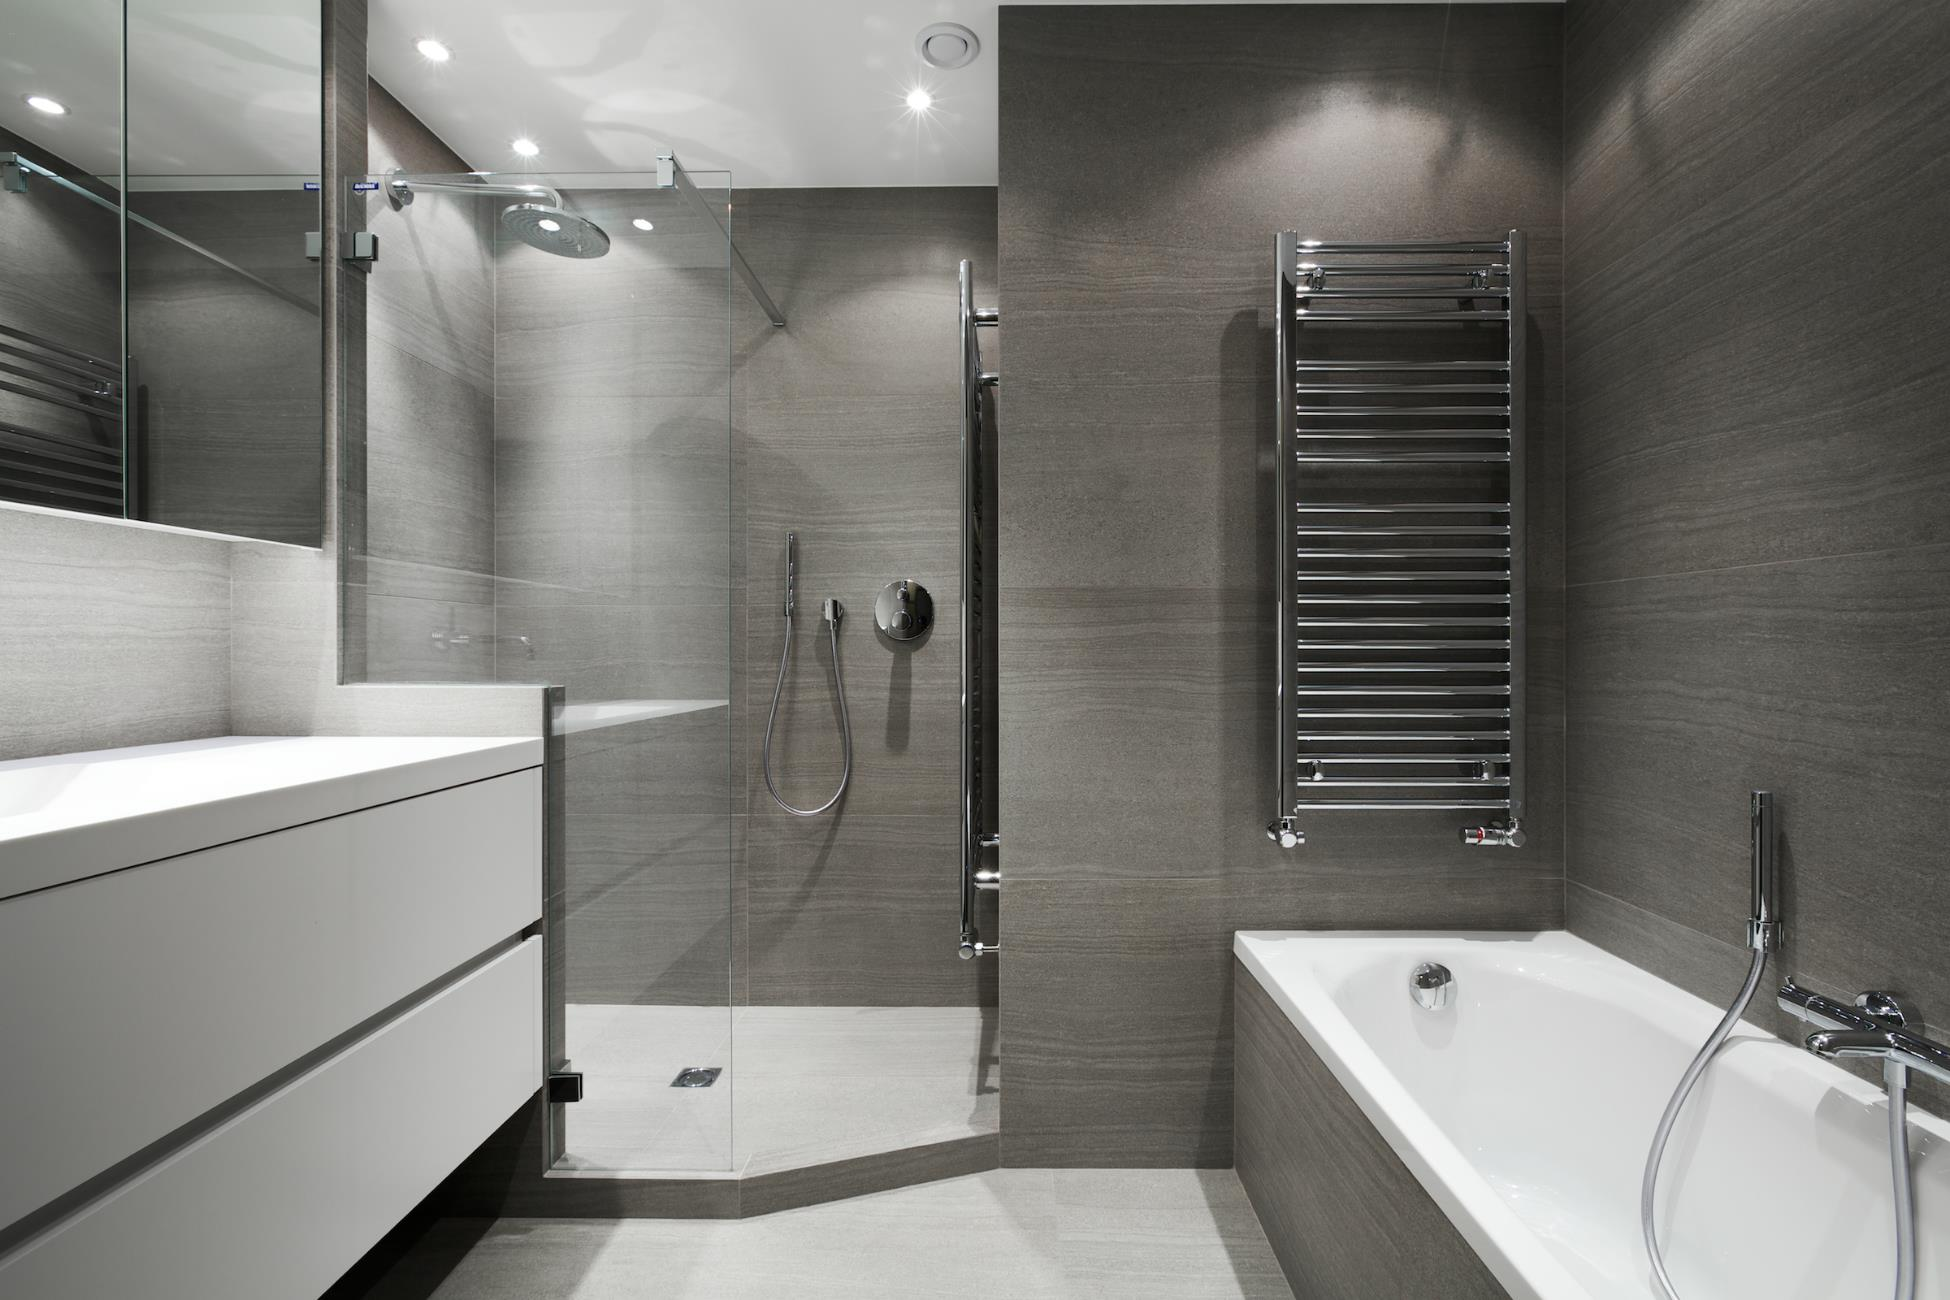 Petite salle de bain douche italienne for Petite salle de bain